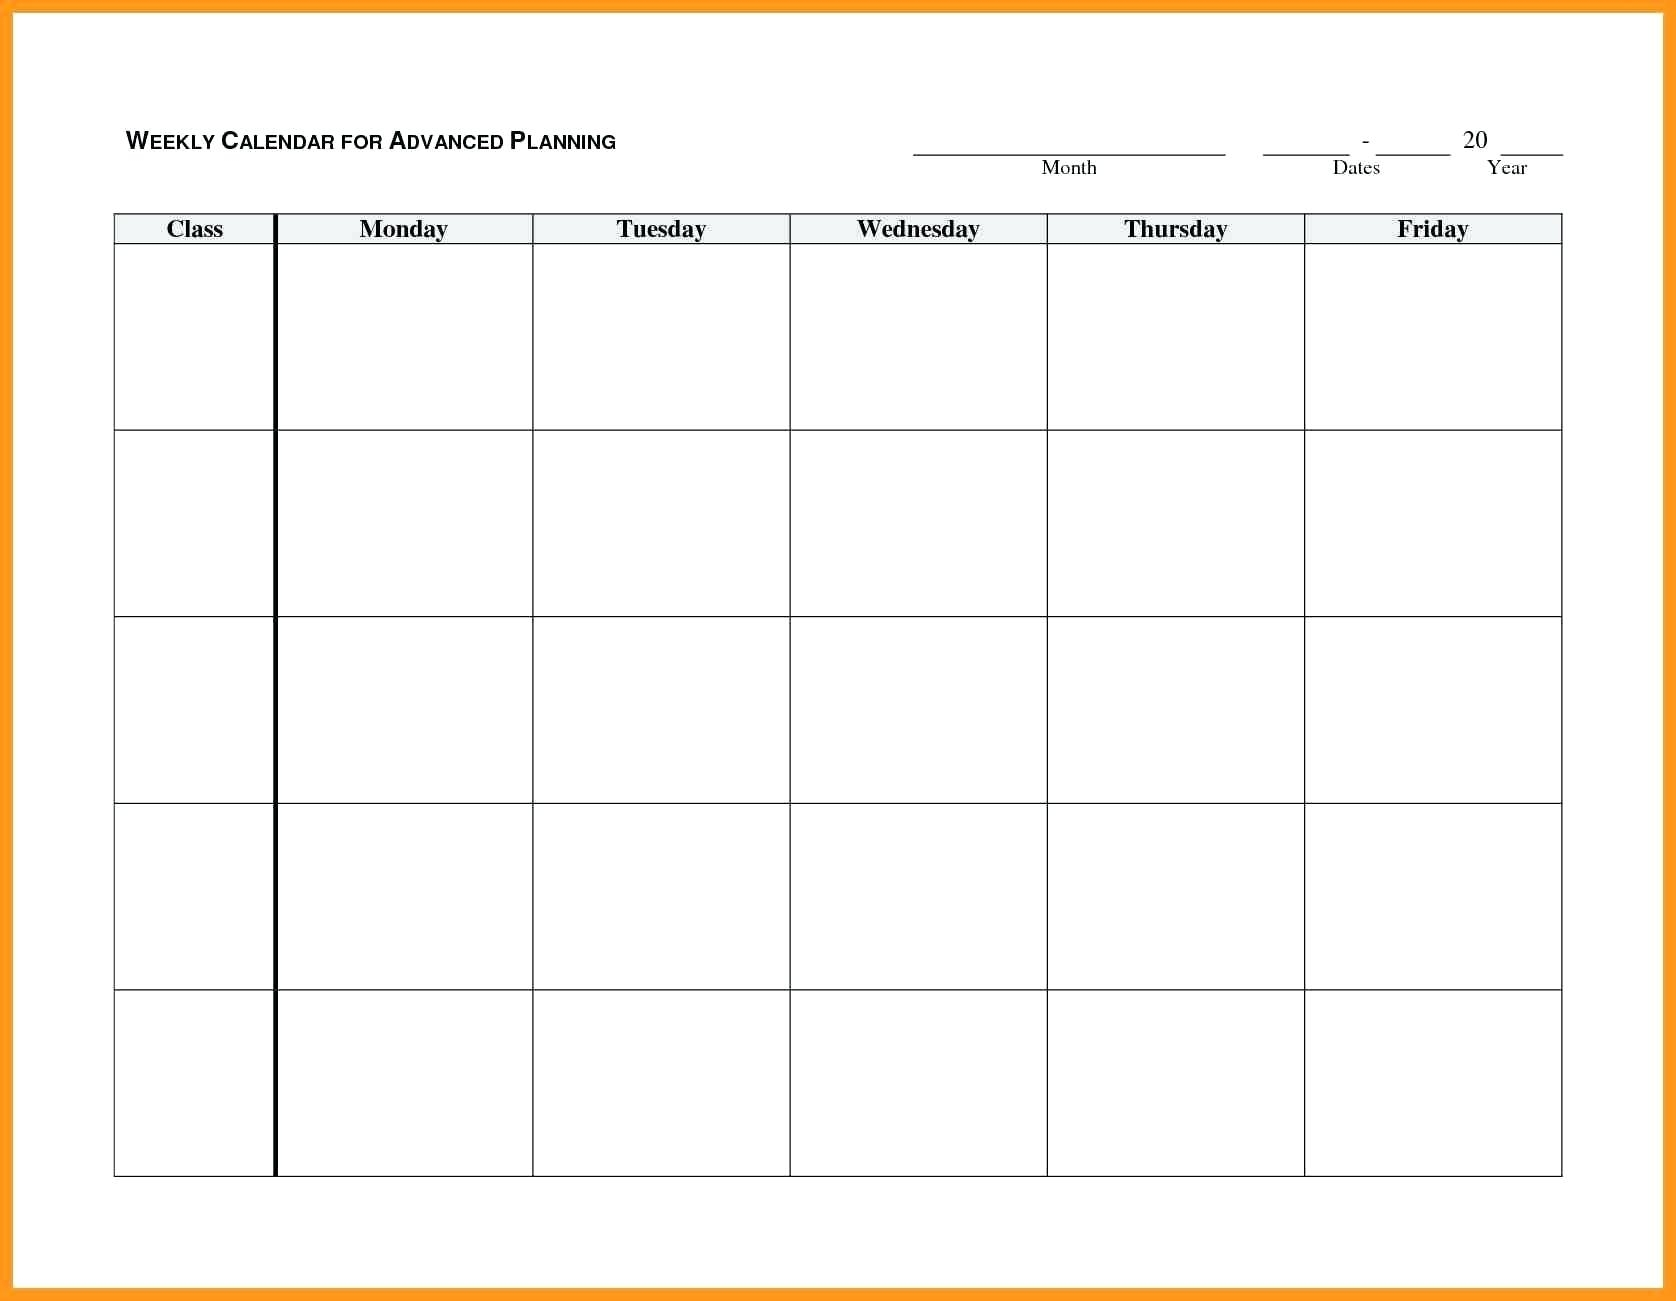 Blank Weekly Ndar Monday Through Friday Template Word Free Printable for Monday Through Friday Planner Template